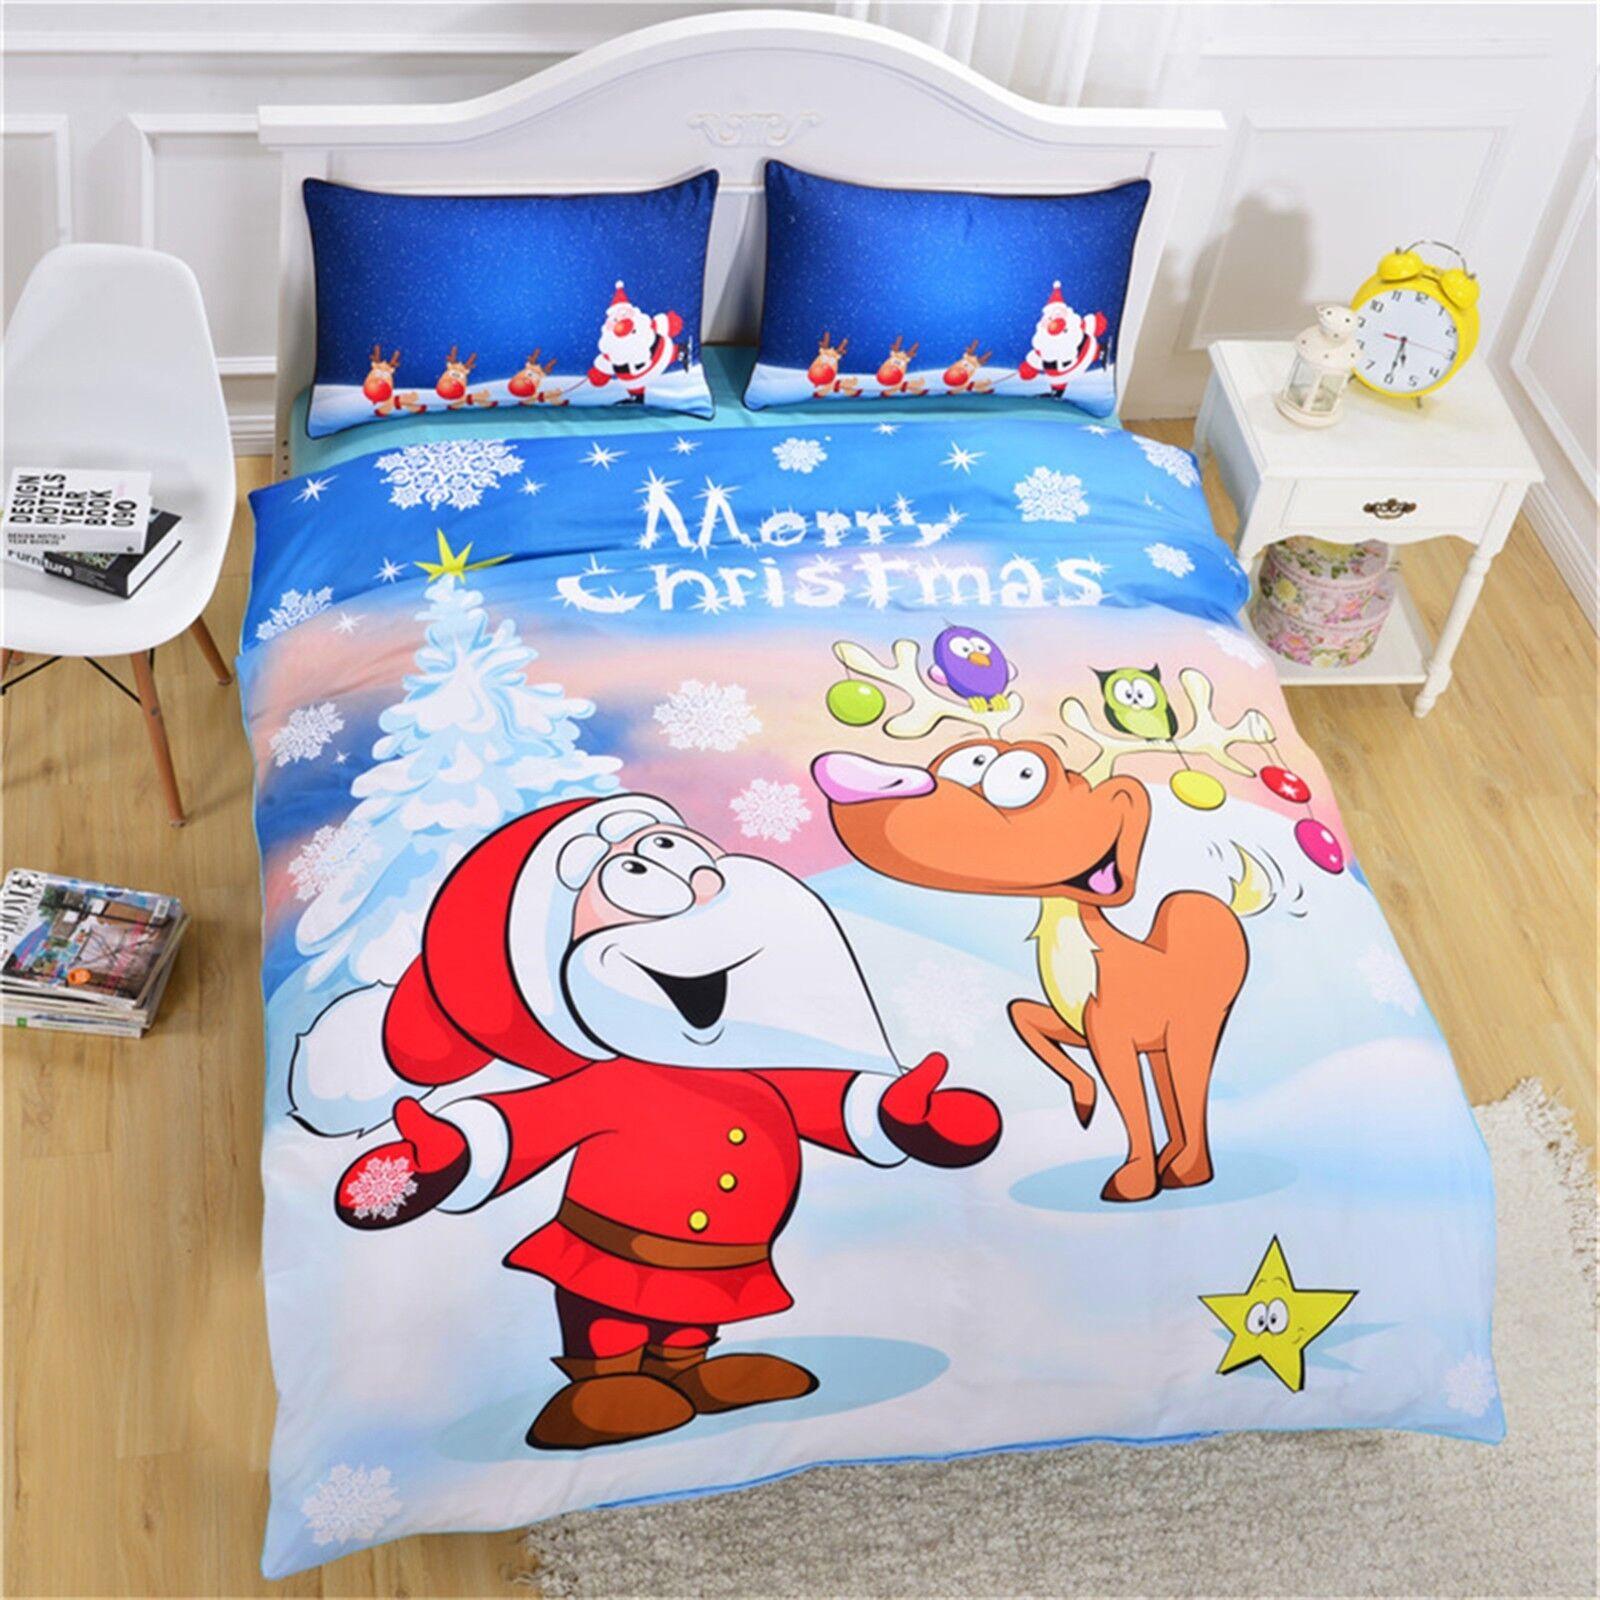 3D Christmas Xmas 59 Bed Pillowcases Quilt Duvet Cover Set Single Queen King AU